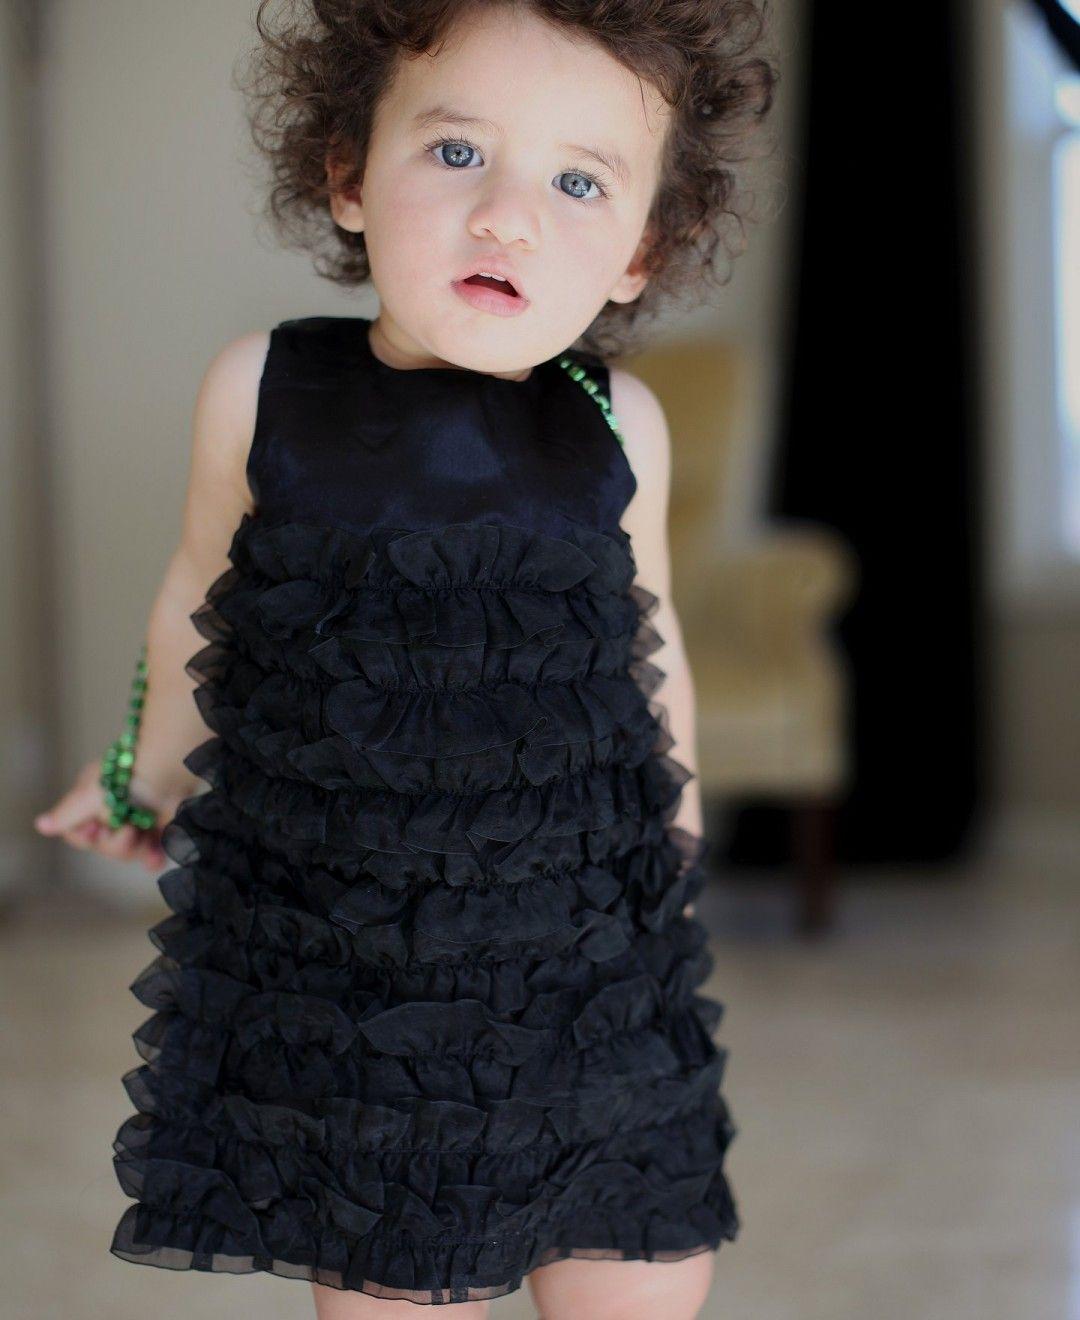 Rufflebutts Com Black Satin Ruffle Dress Satin Ruffle Dress Black Ruffle Dress Black Satin Dress [ 1320 x 1080 Pixel ]